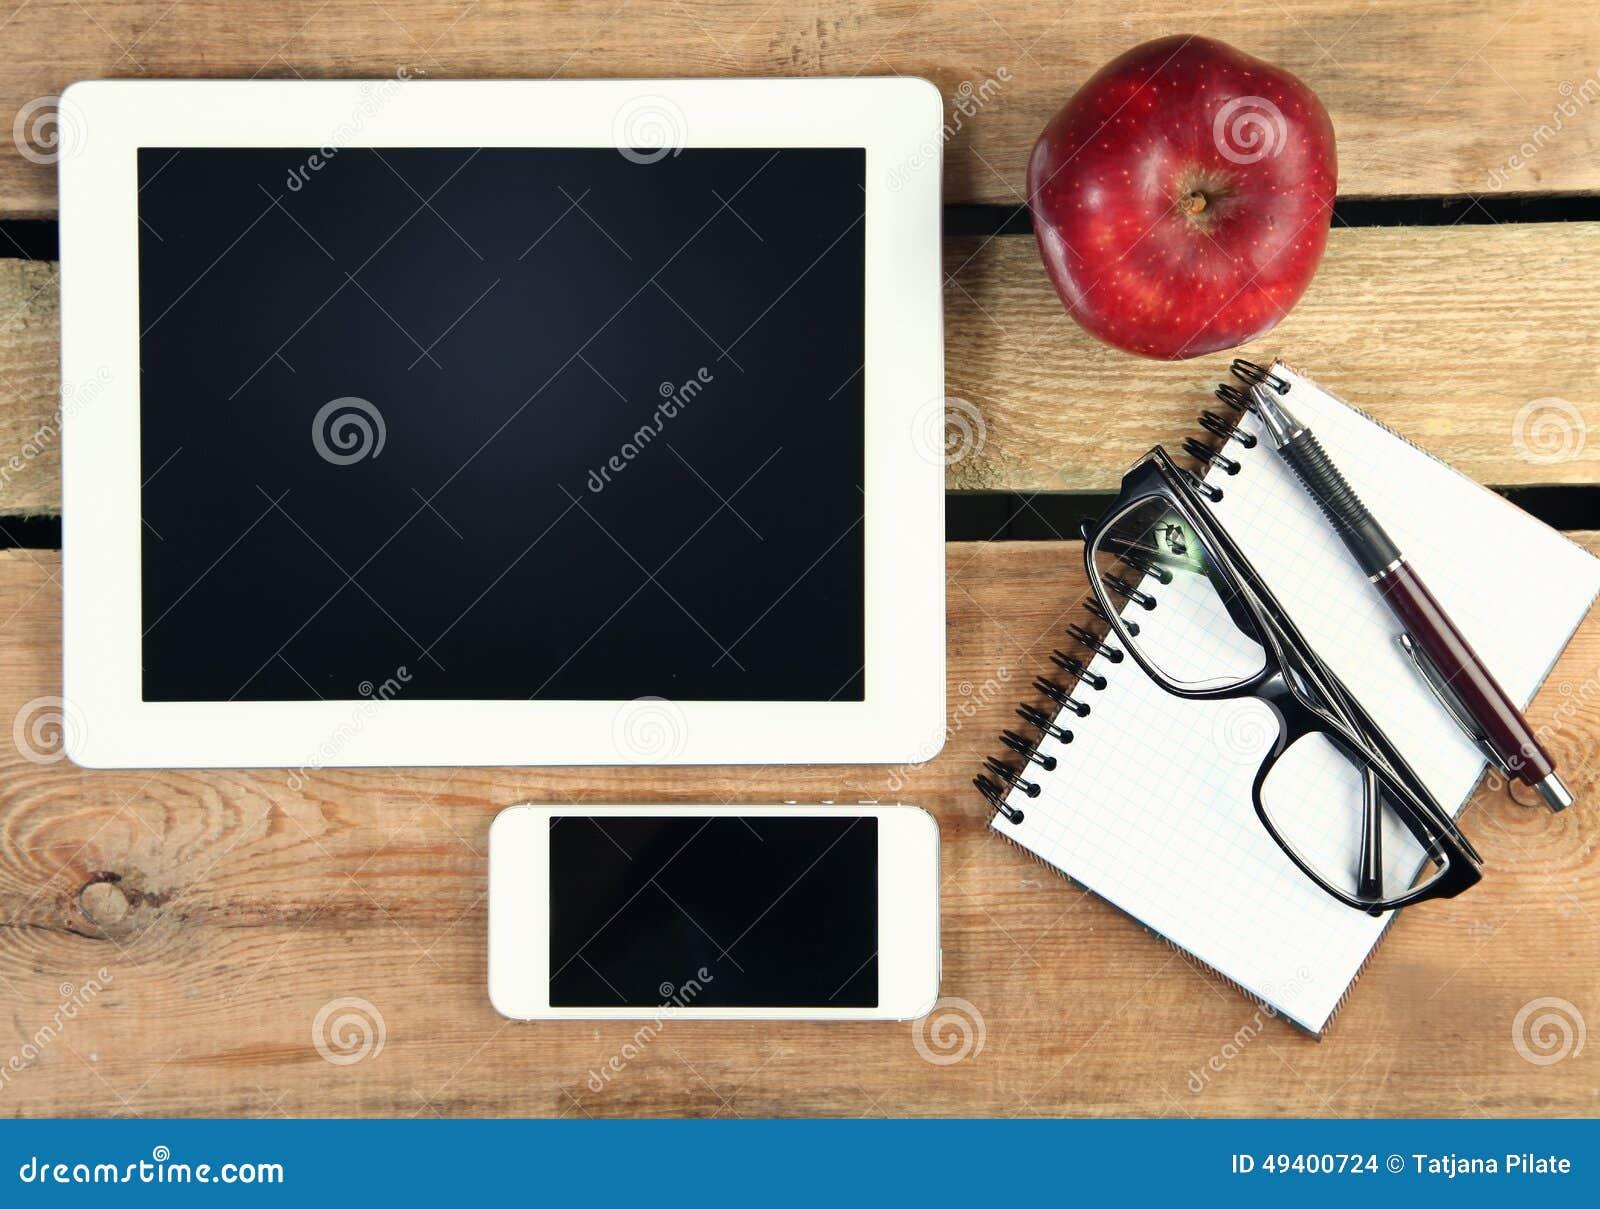 Download Roter Apfel stockfoto. Bild von digital, spindel, feder - 49400724